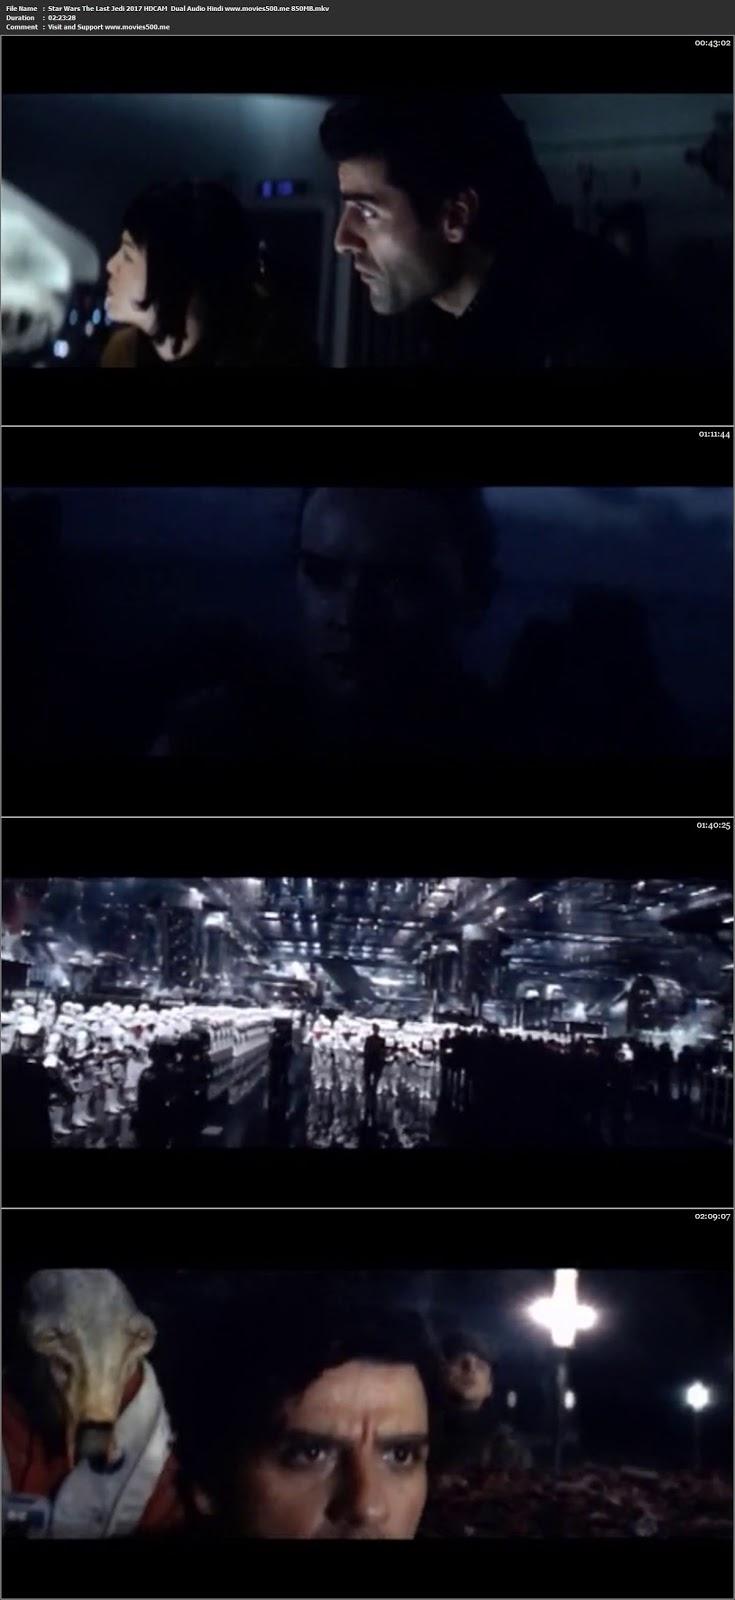 Star Wars The Last Jedi 2017 Dual Audio Hindi HDCAM 720p at movies500.info